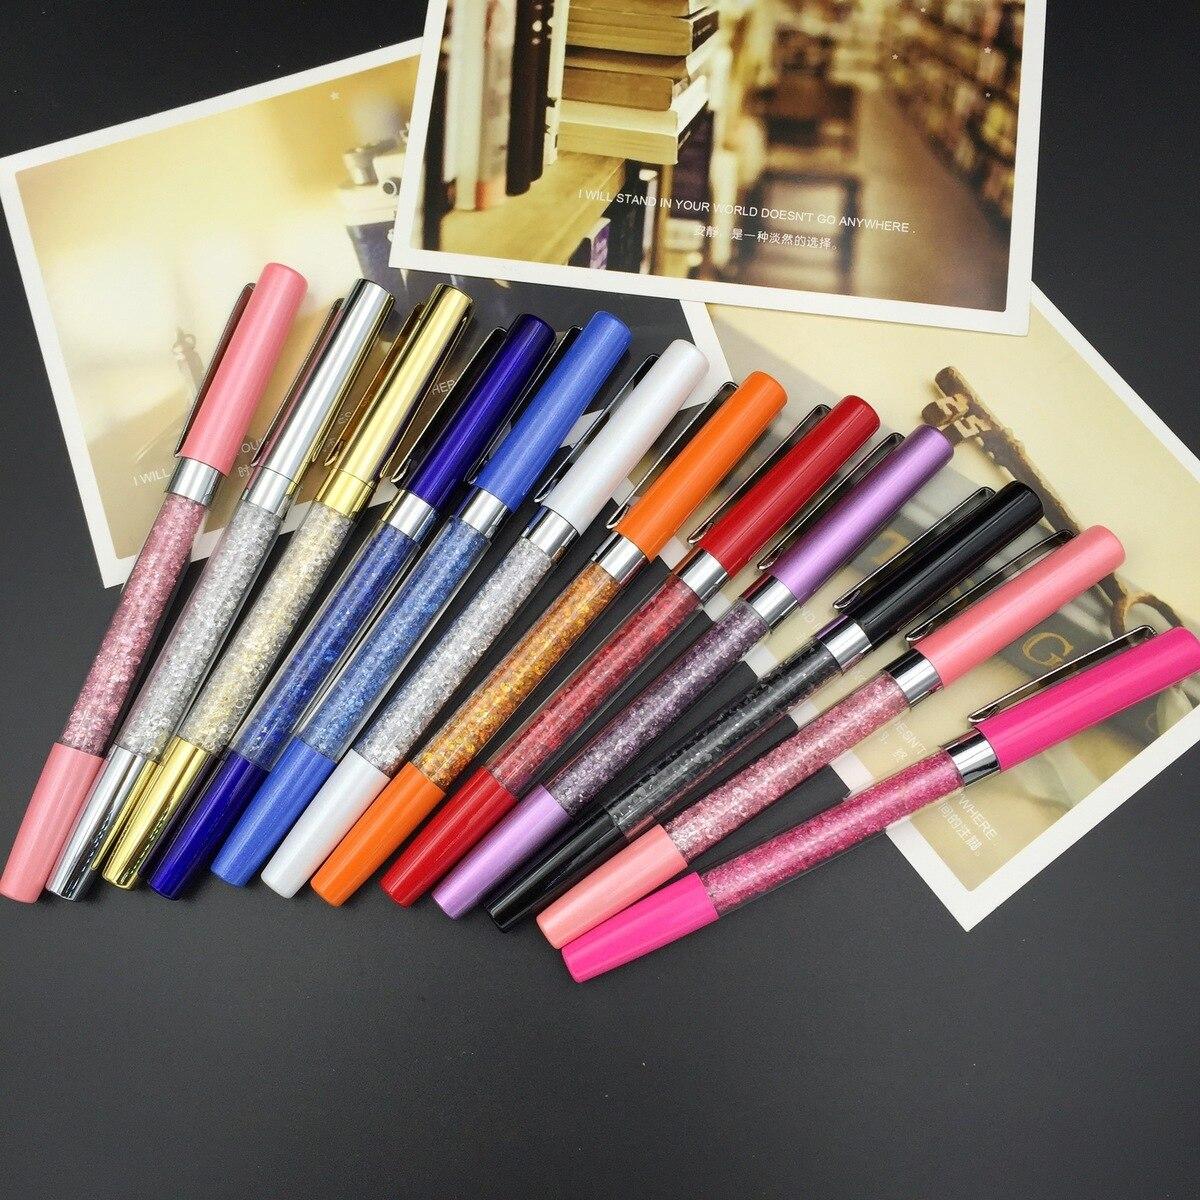 все цены на 100pcs/set New Crystal Diamond Pen Metal Pen Color Can Be Customized Crystal Pen онлайн